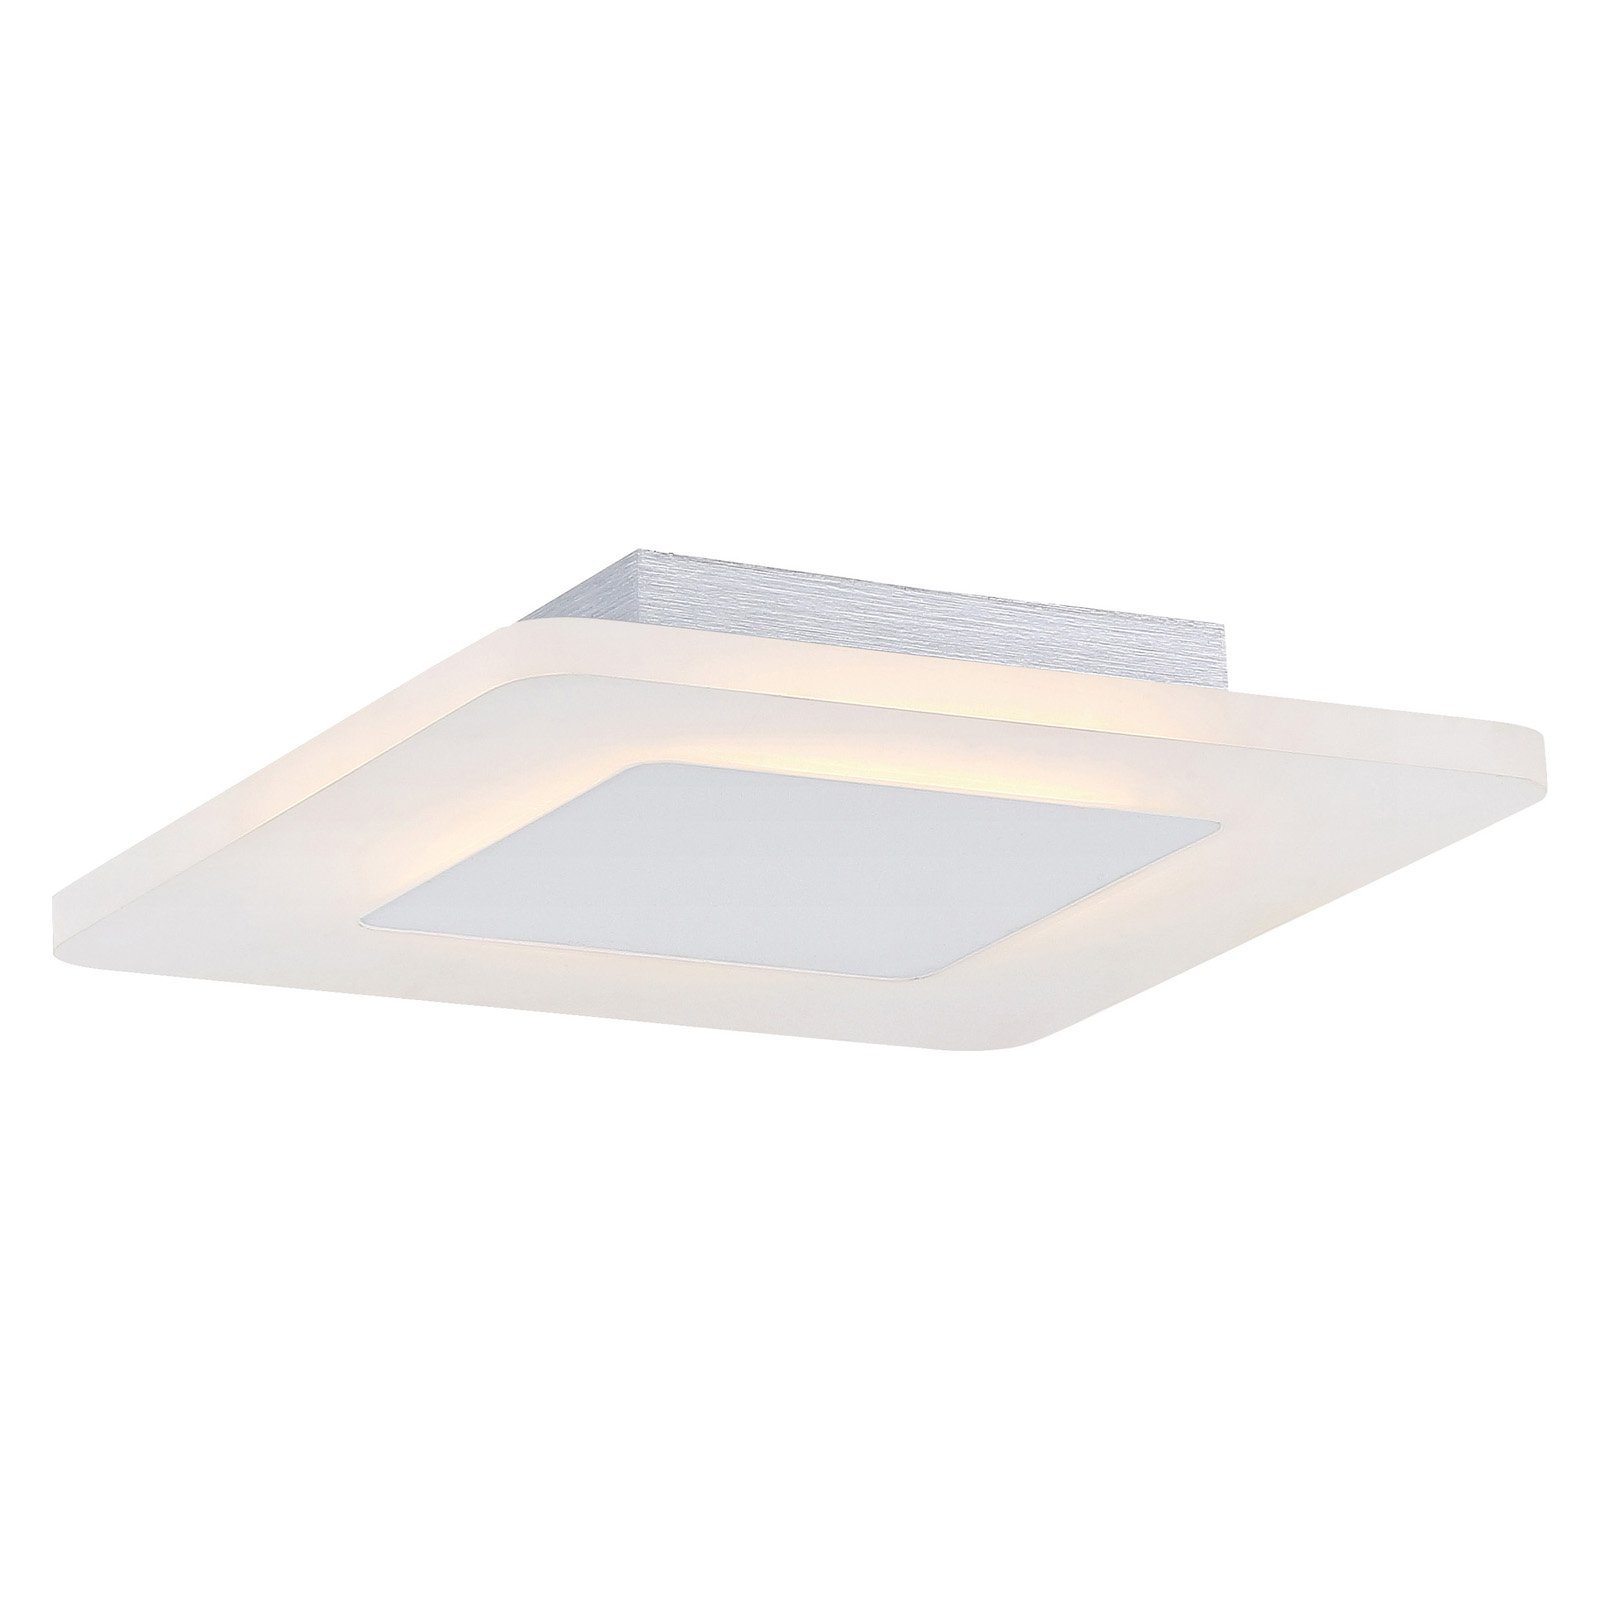 Quoizel Aglow PCAW1611W Flush Mount Light by Quoizel